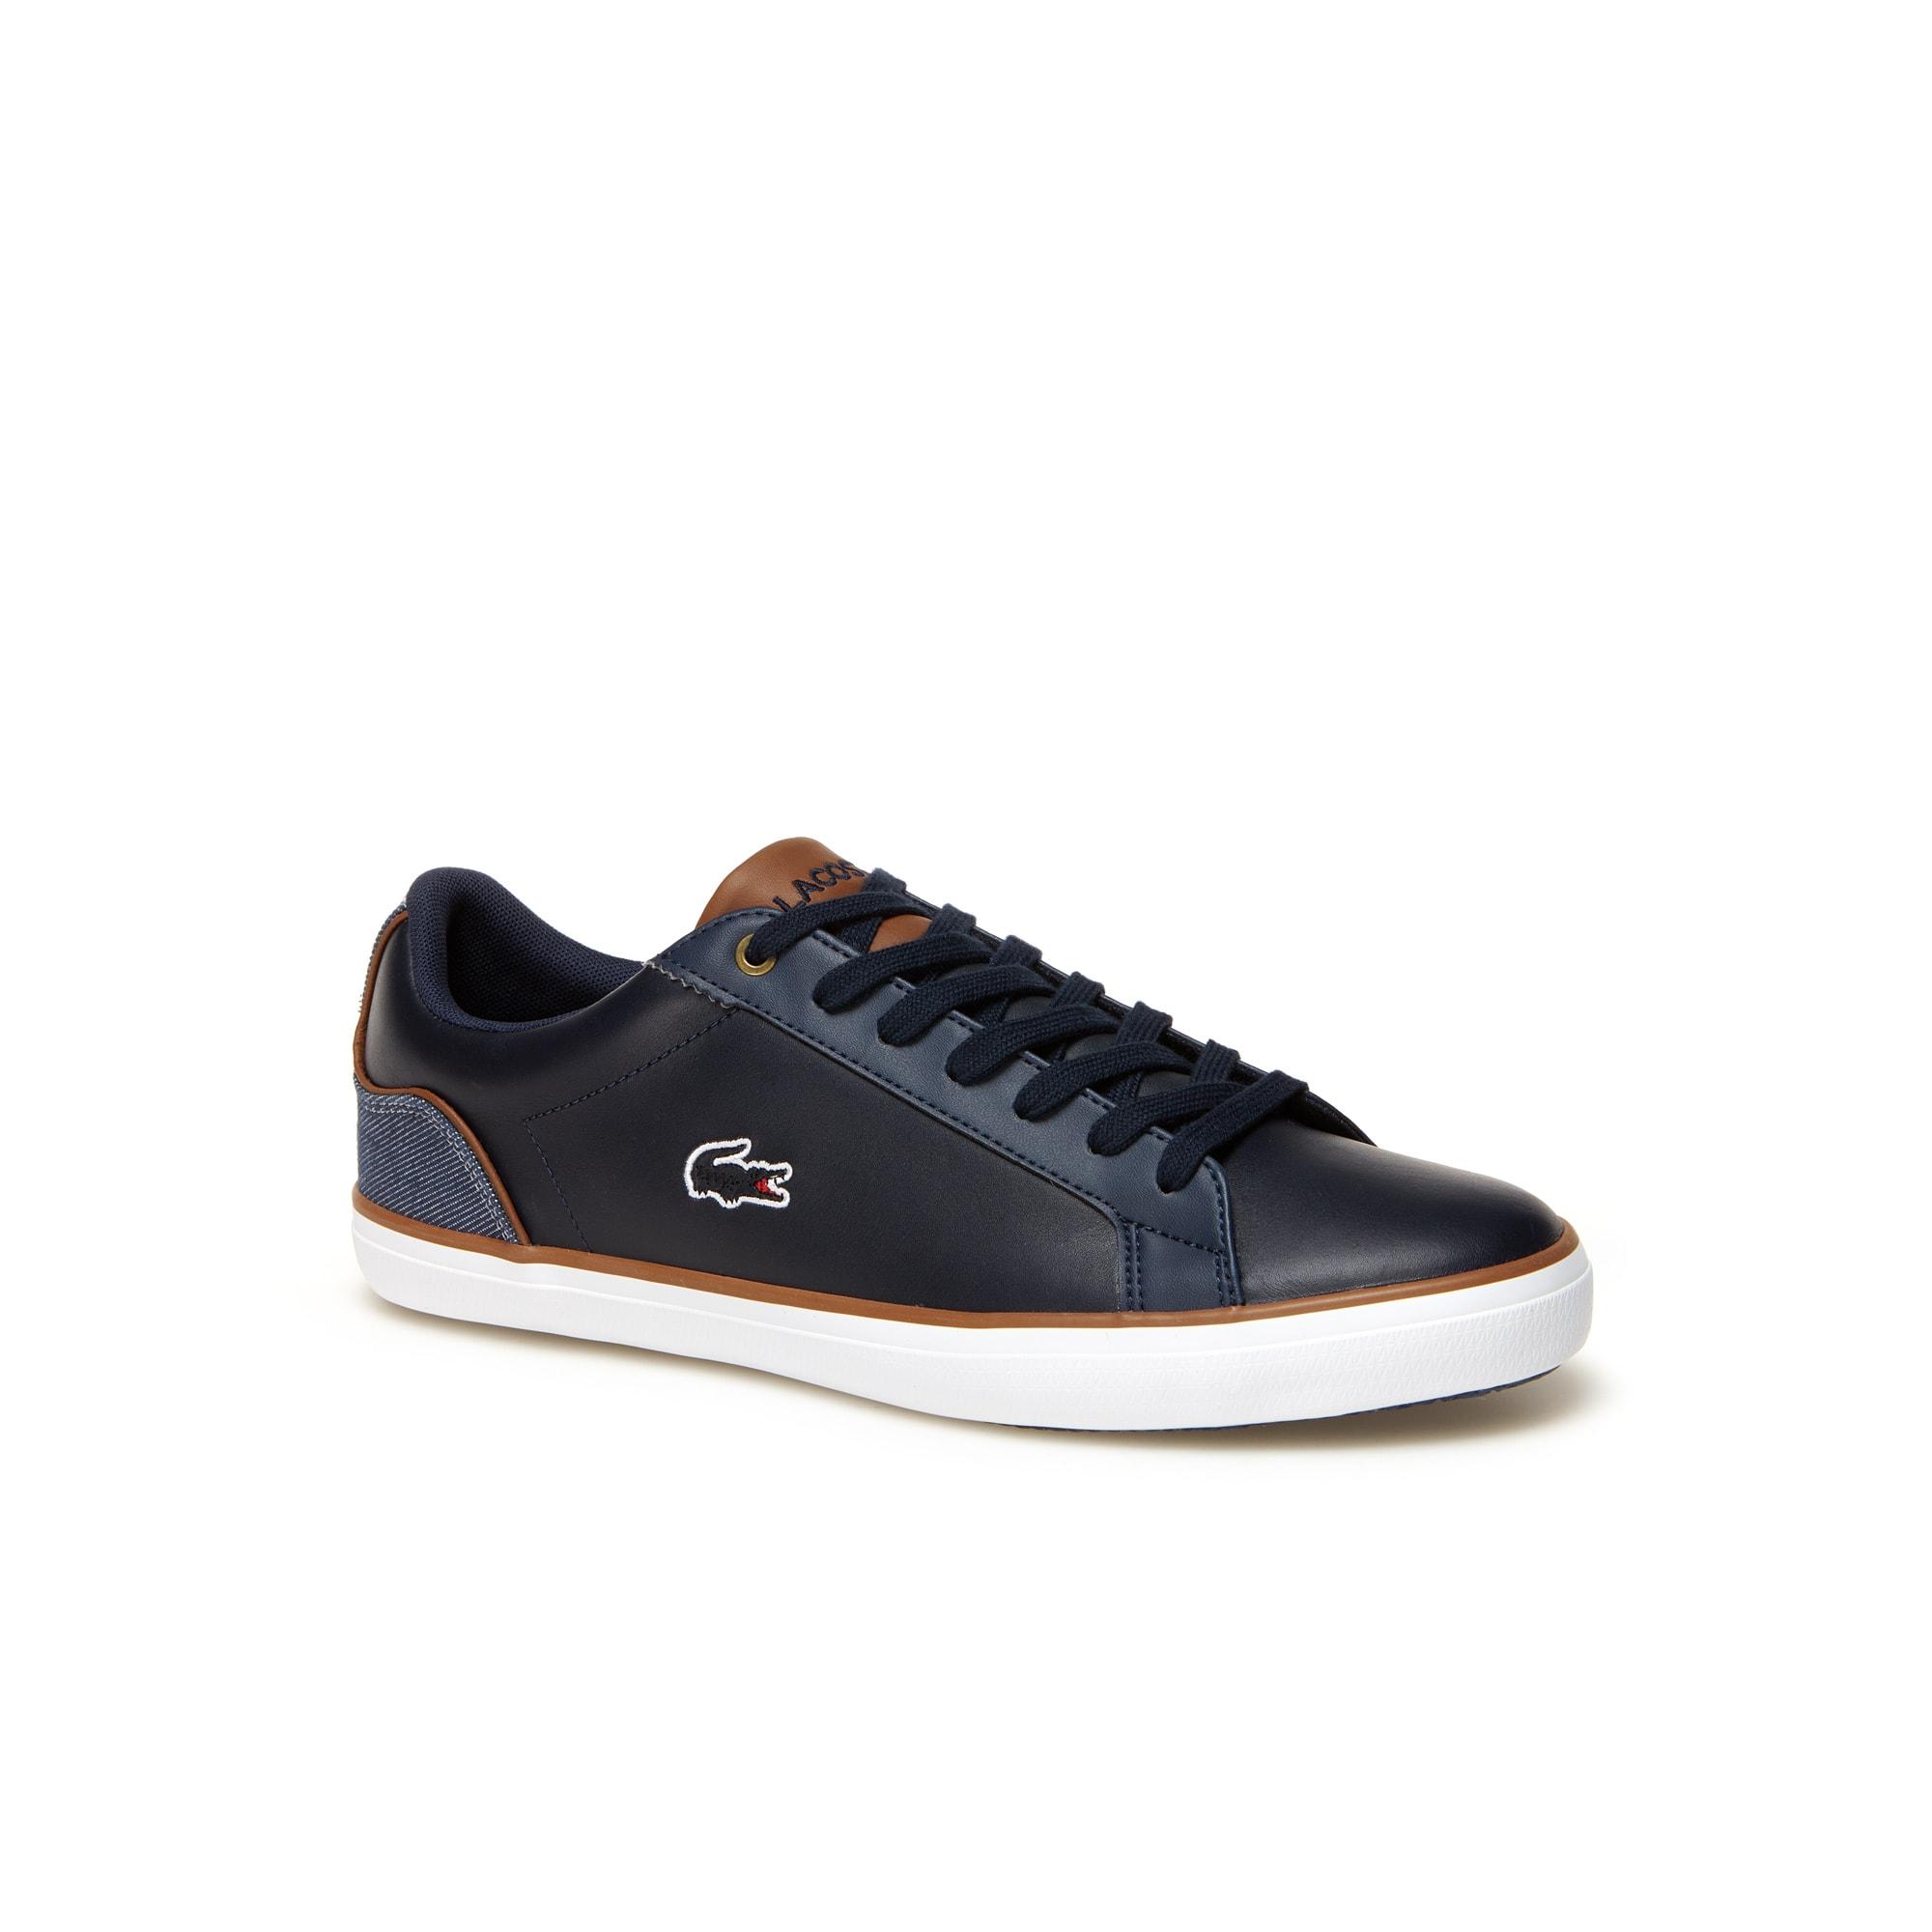 Herren-Sneakers LEROND aus Leder